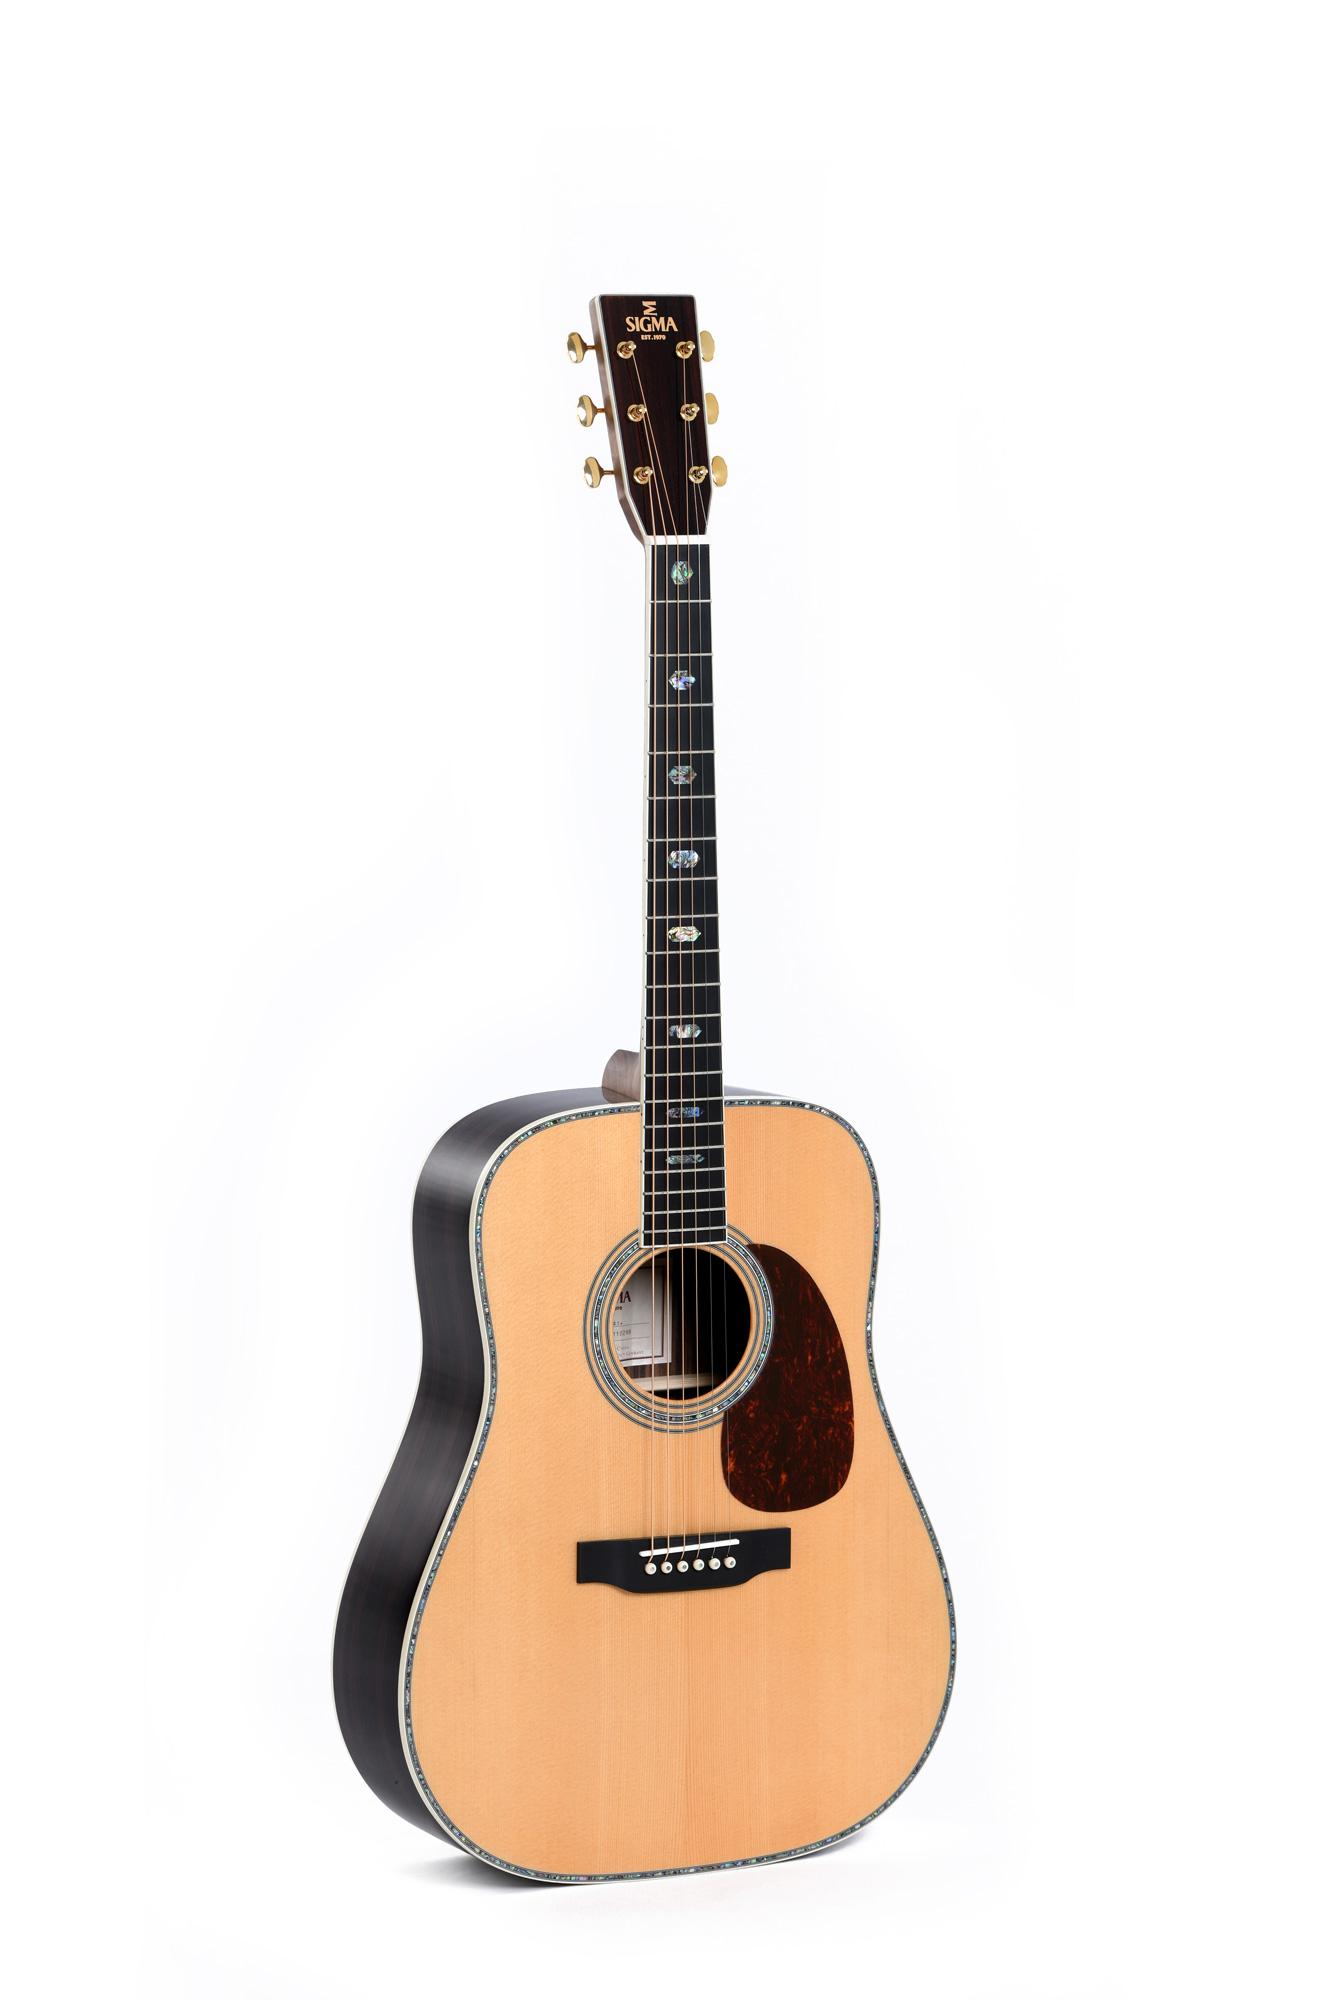 Sigma DT-41+ L.R. Baggs Anthem Pickup